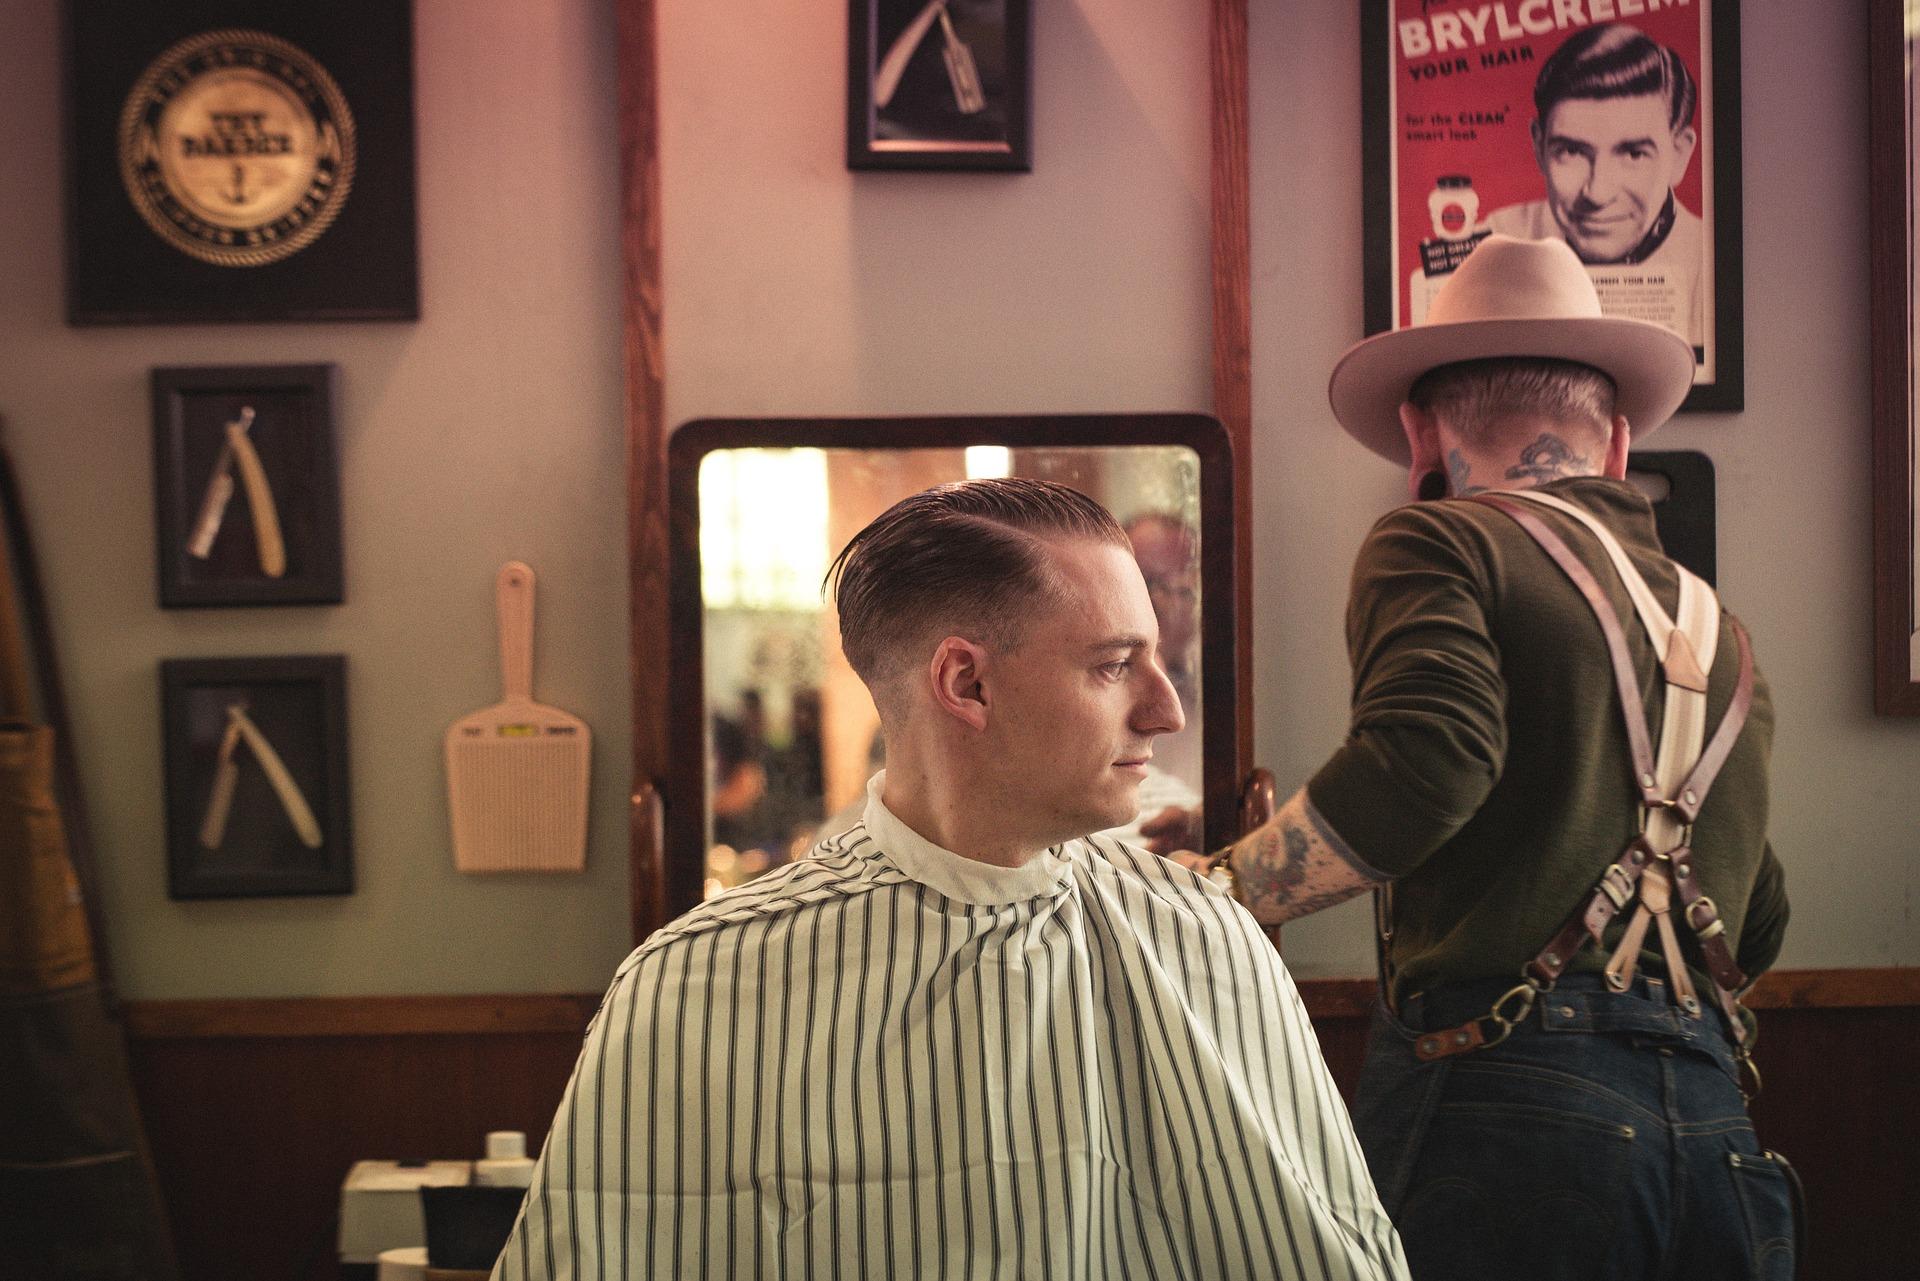 haircut barbershop salon.jpg